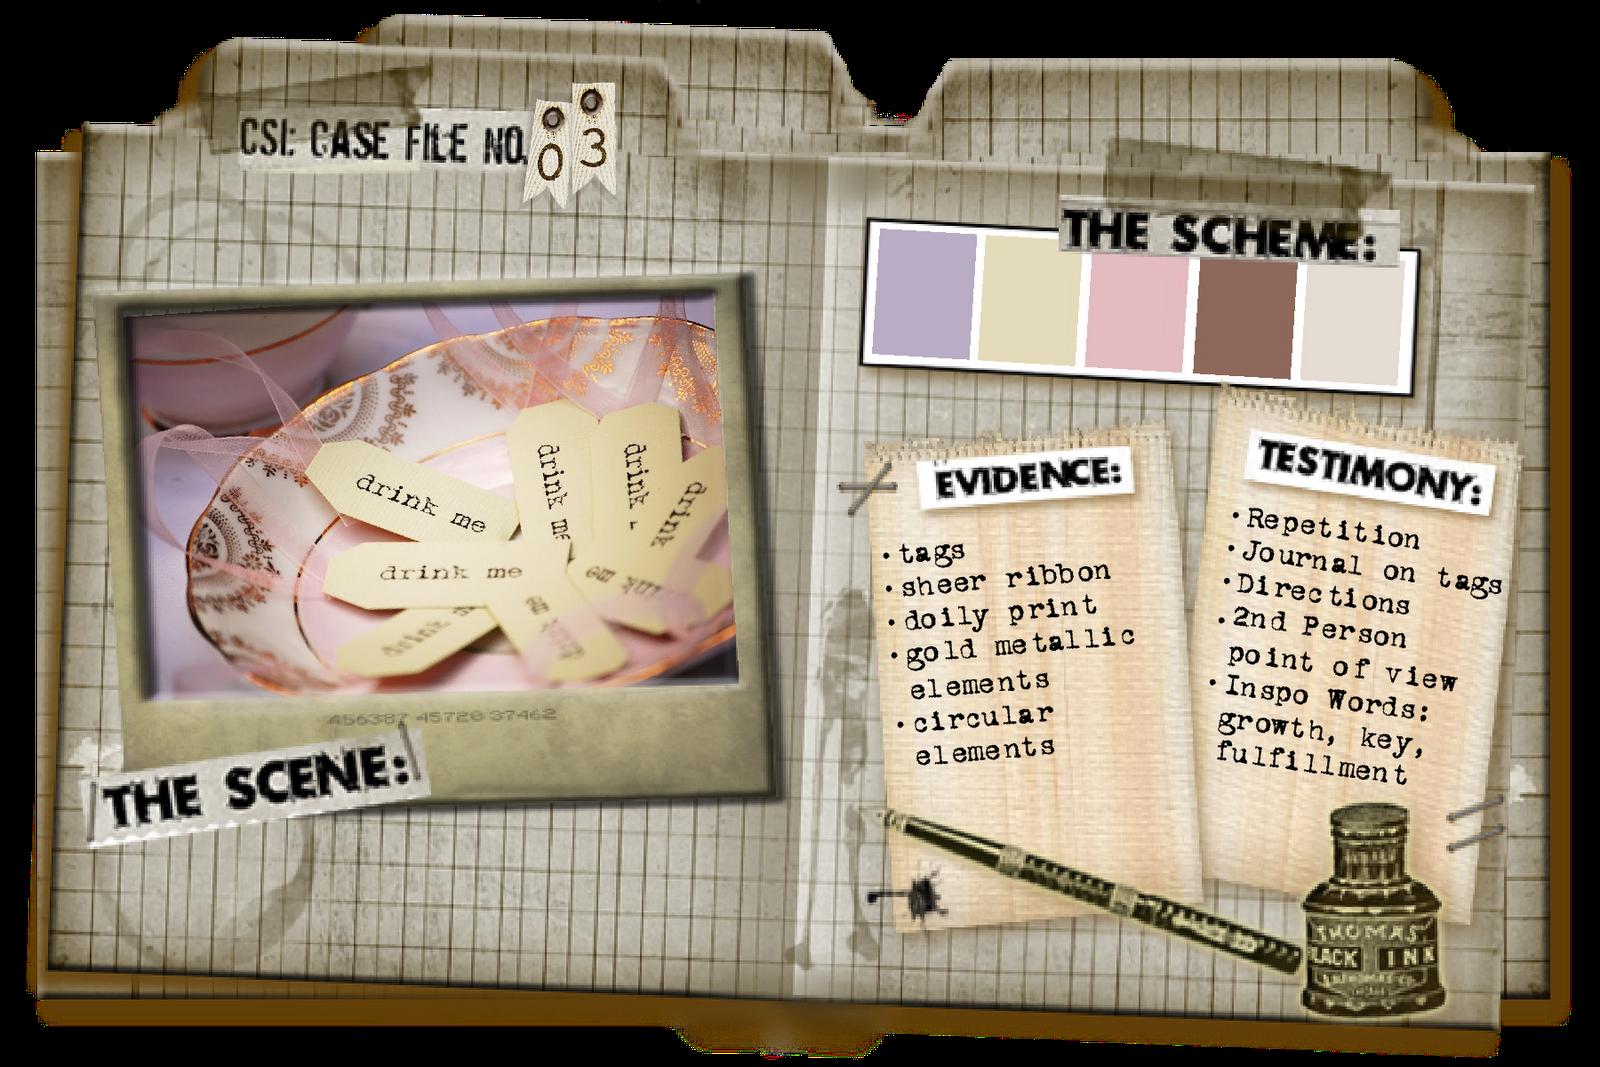 Little Scraps of Magic: Snap 101 - CSI Case File No. 3 Is ...